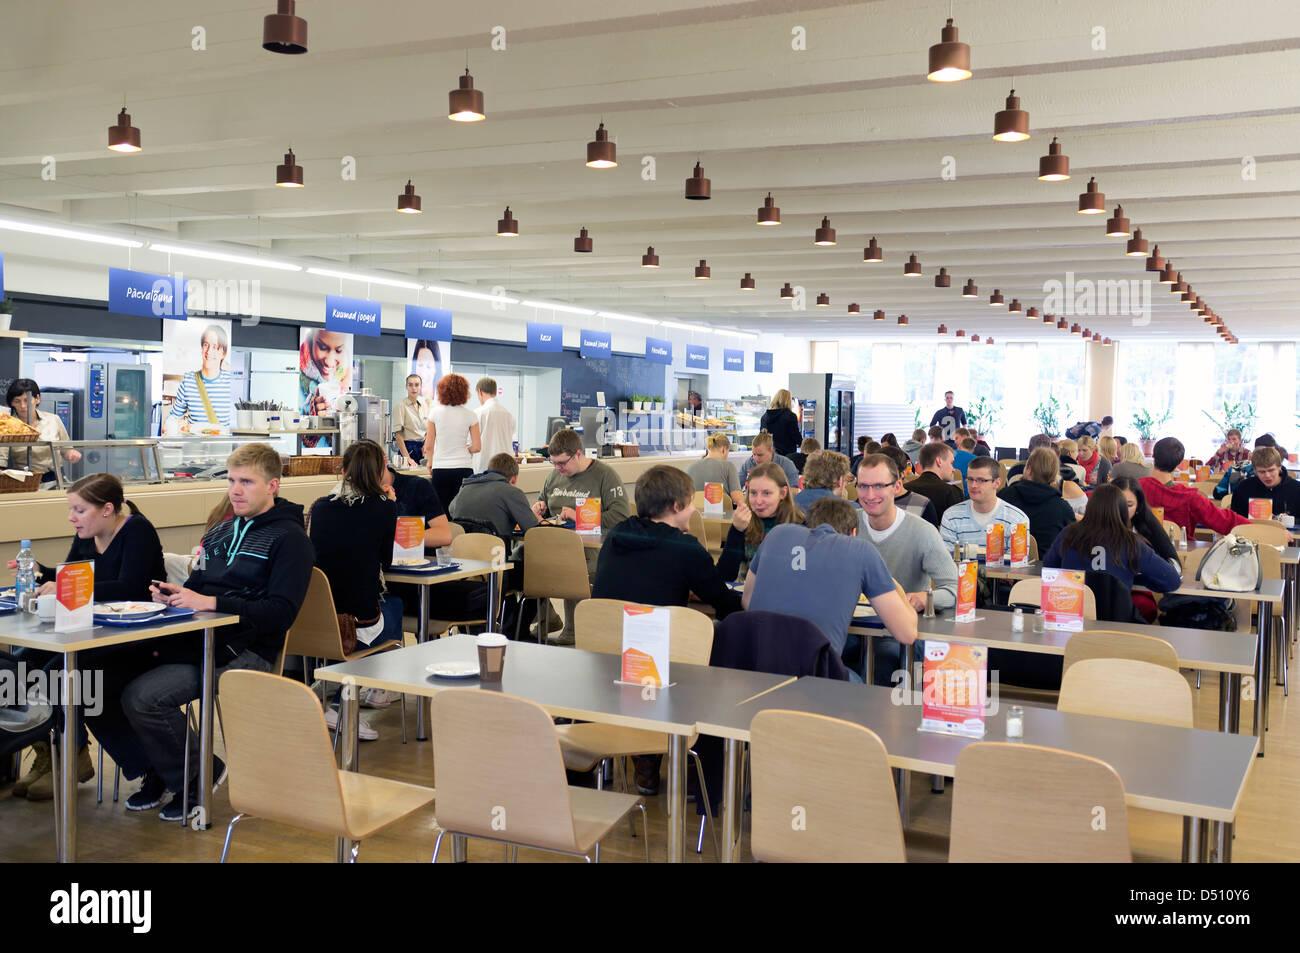 Tallinn, Estonia, students in the cafeteria of the Technical University of Tallinn - Stock Image